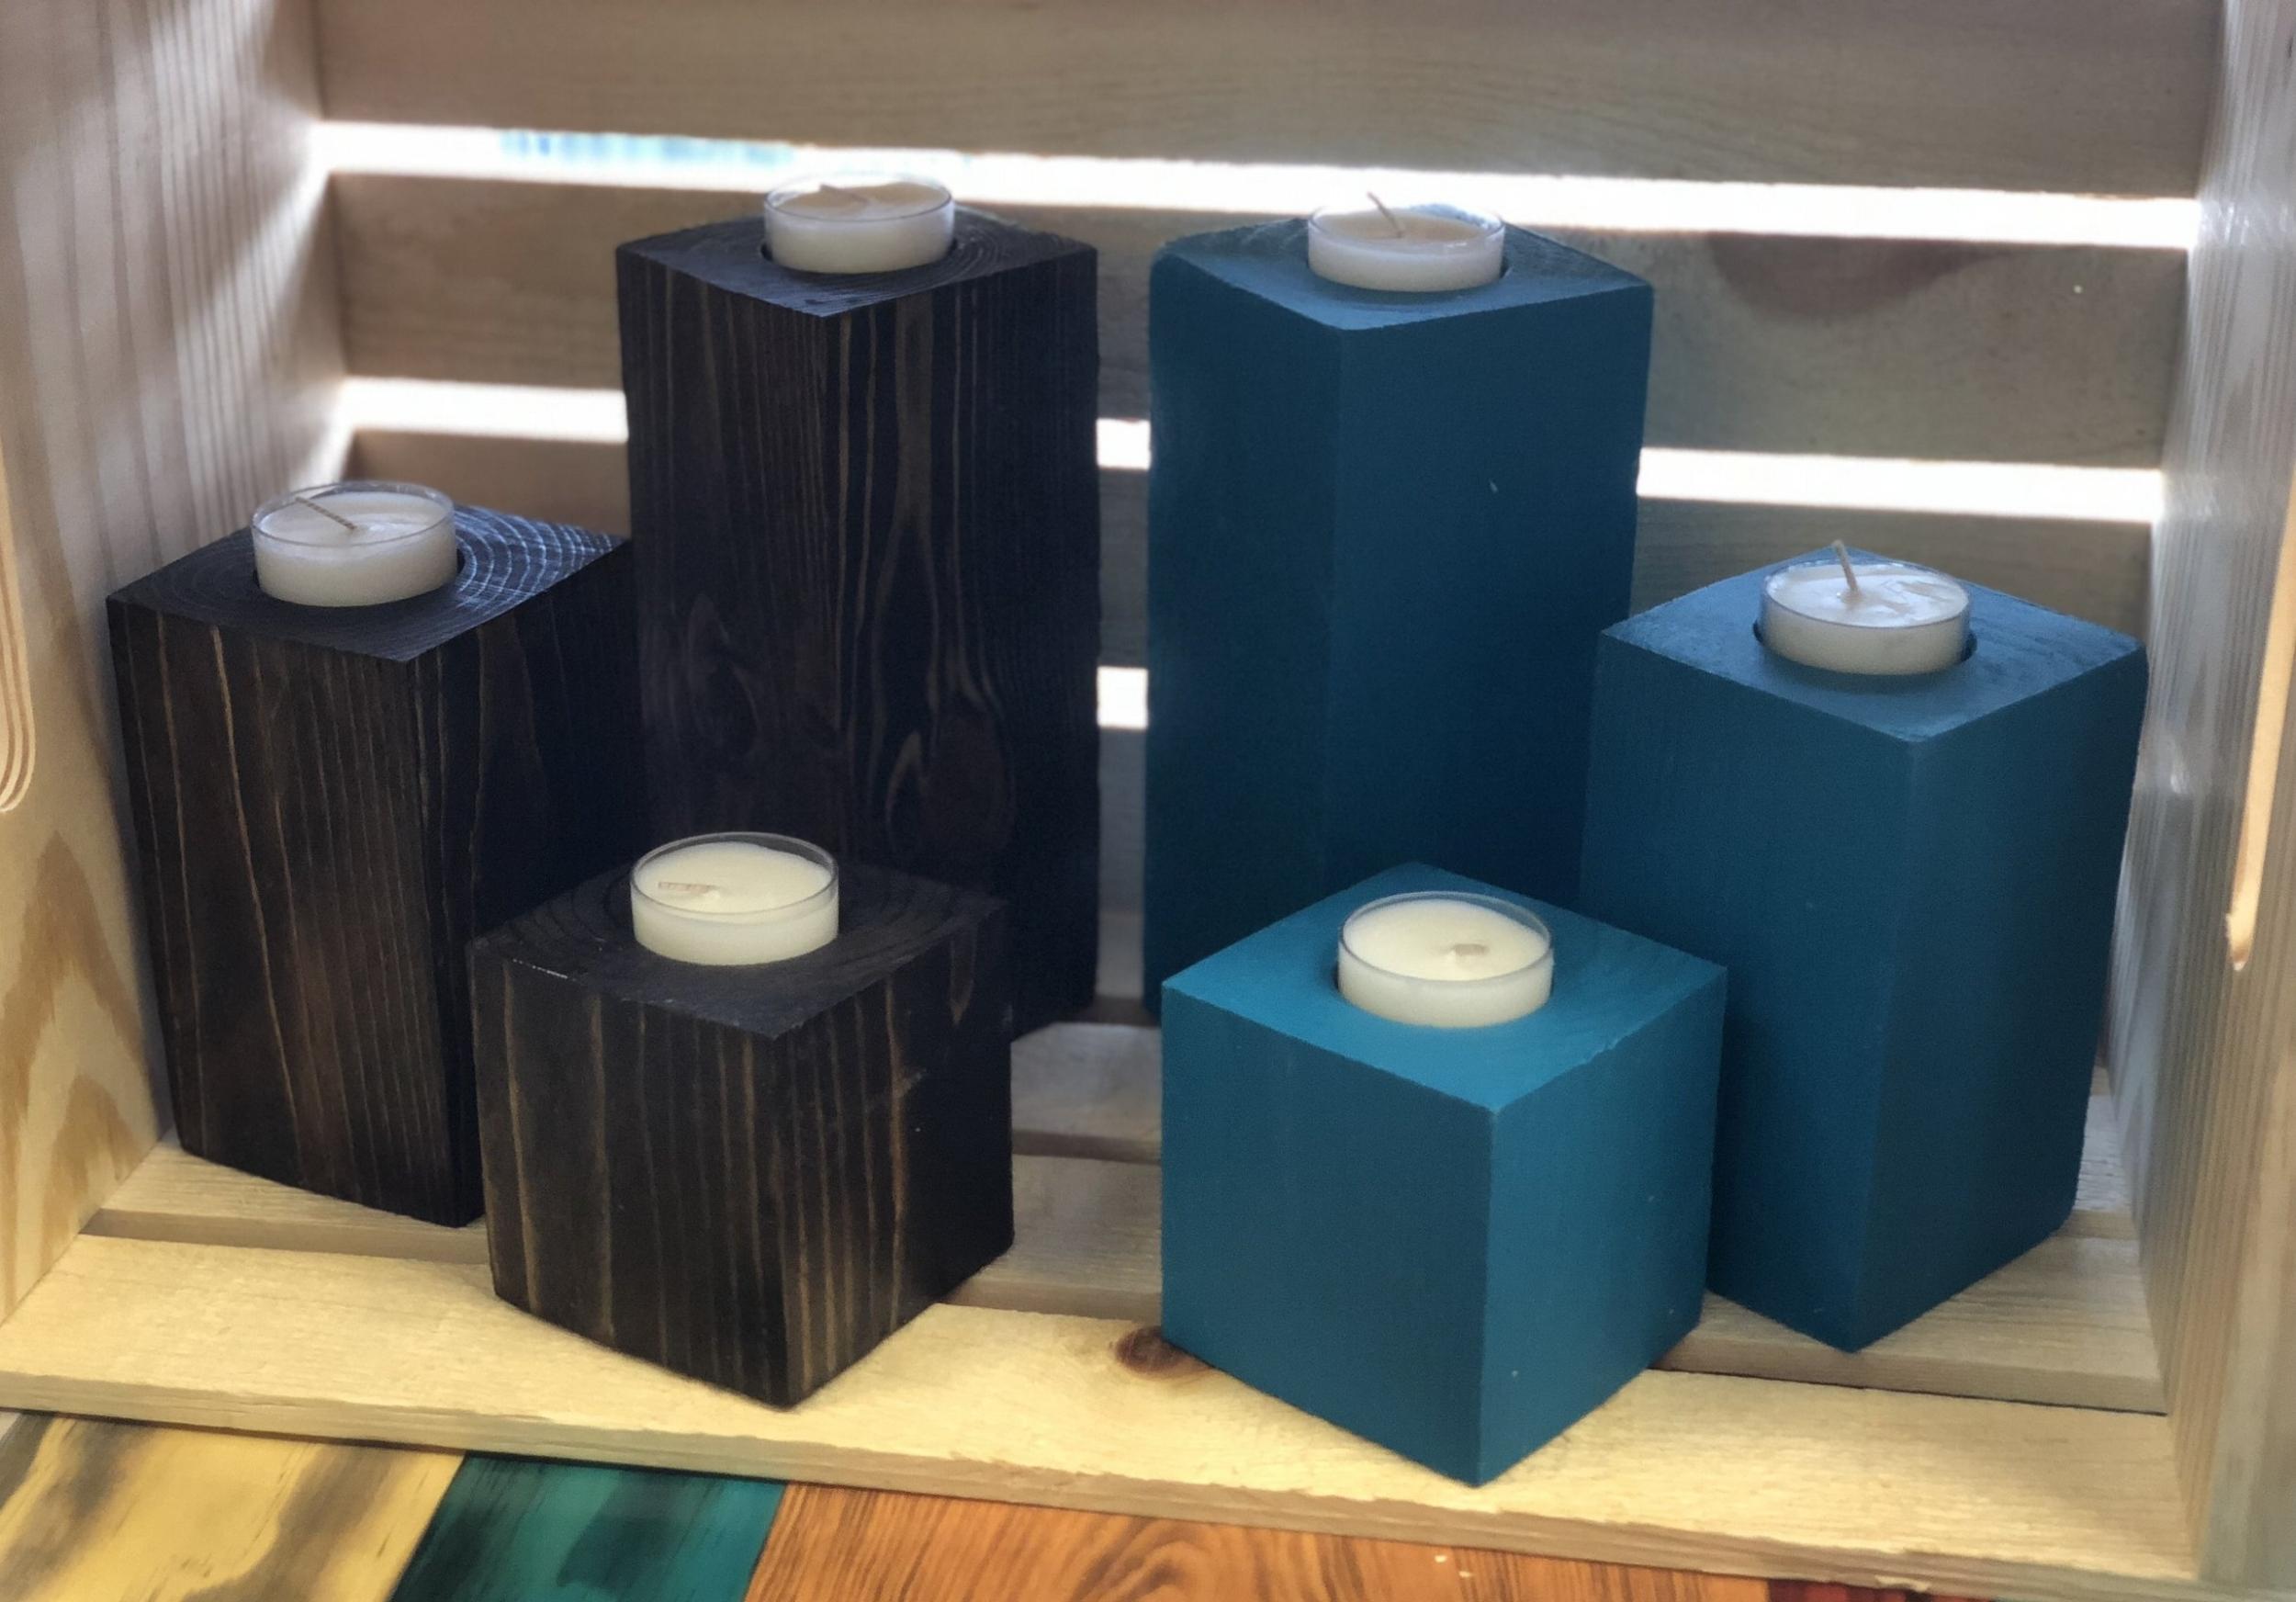 Single tea light holders in set of 3's